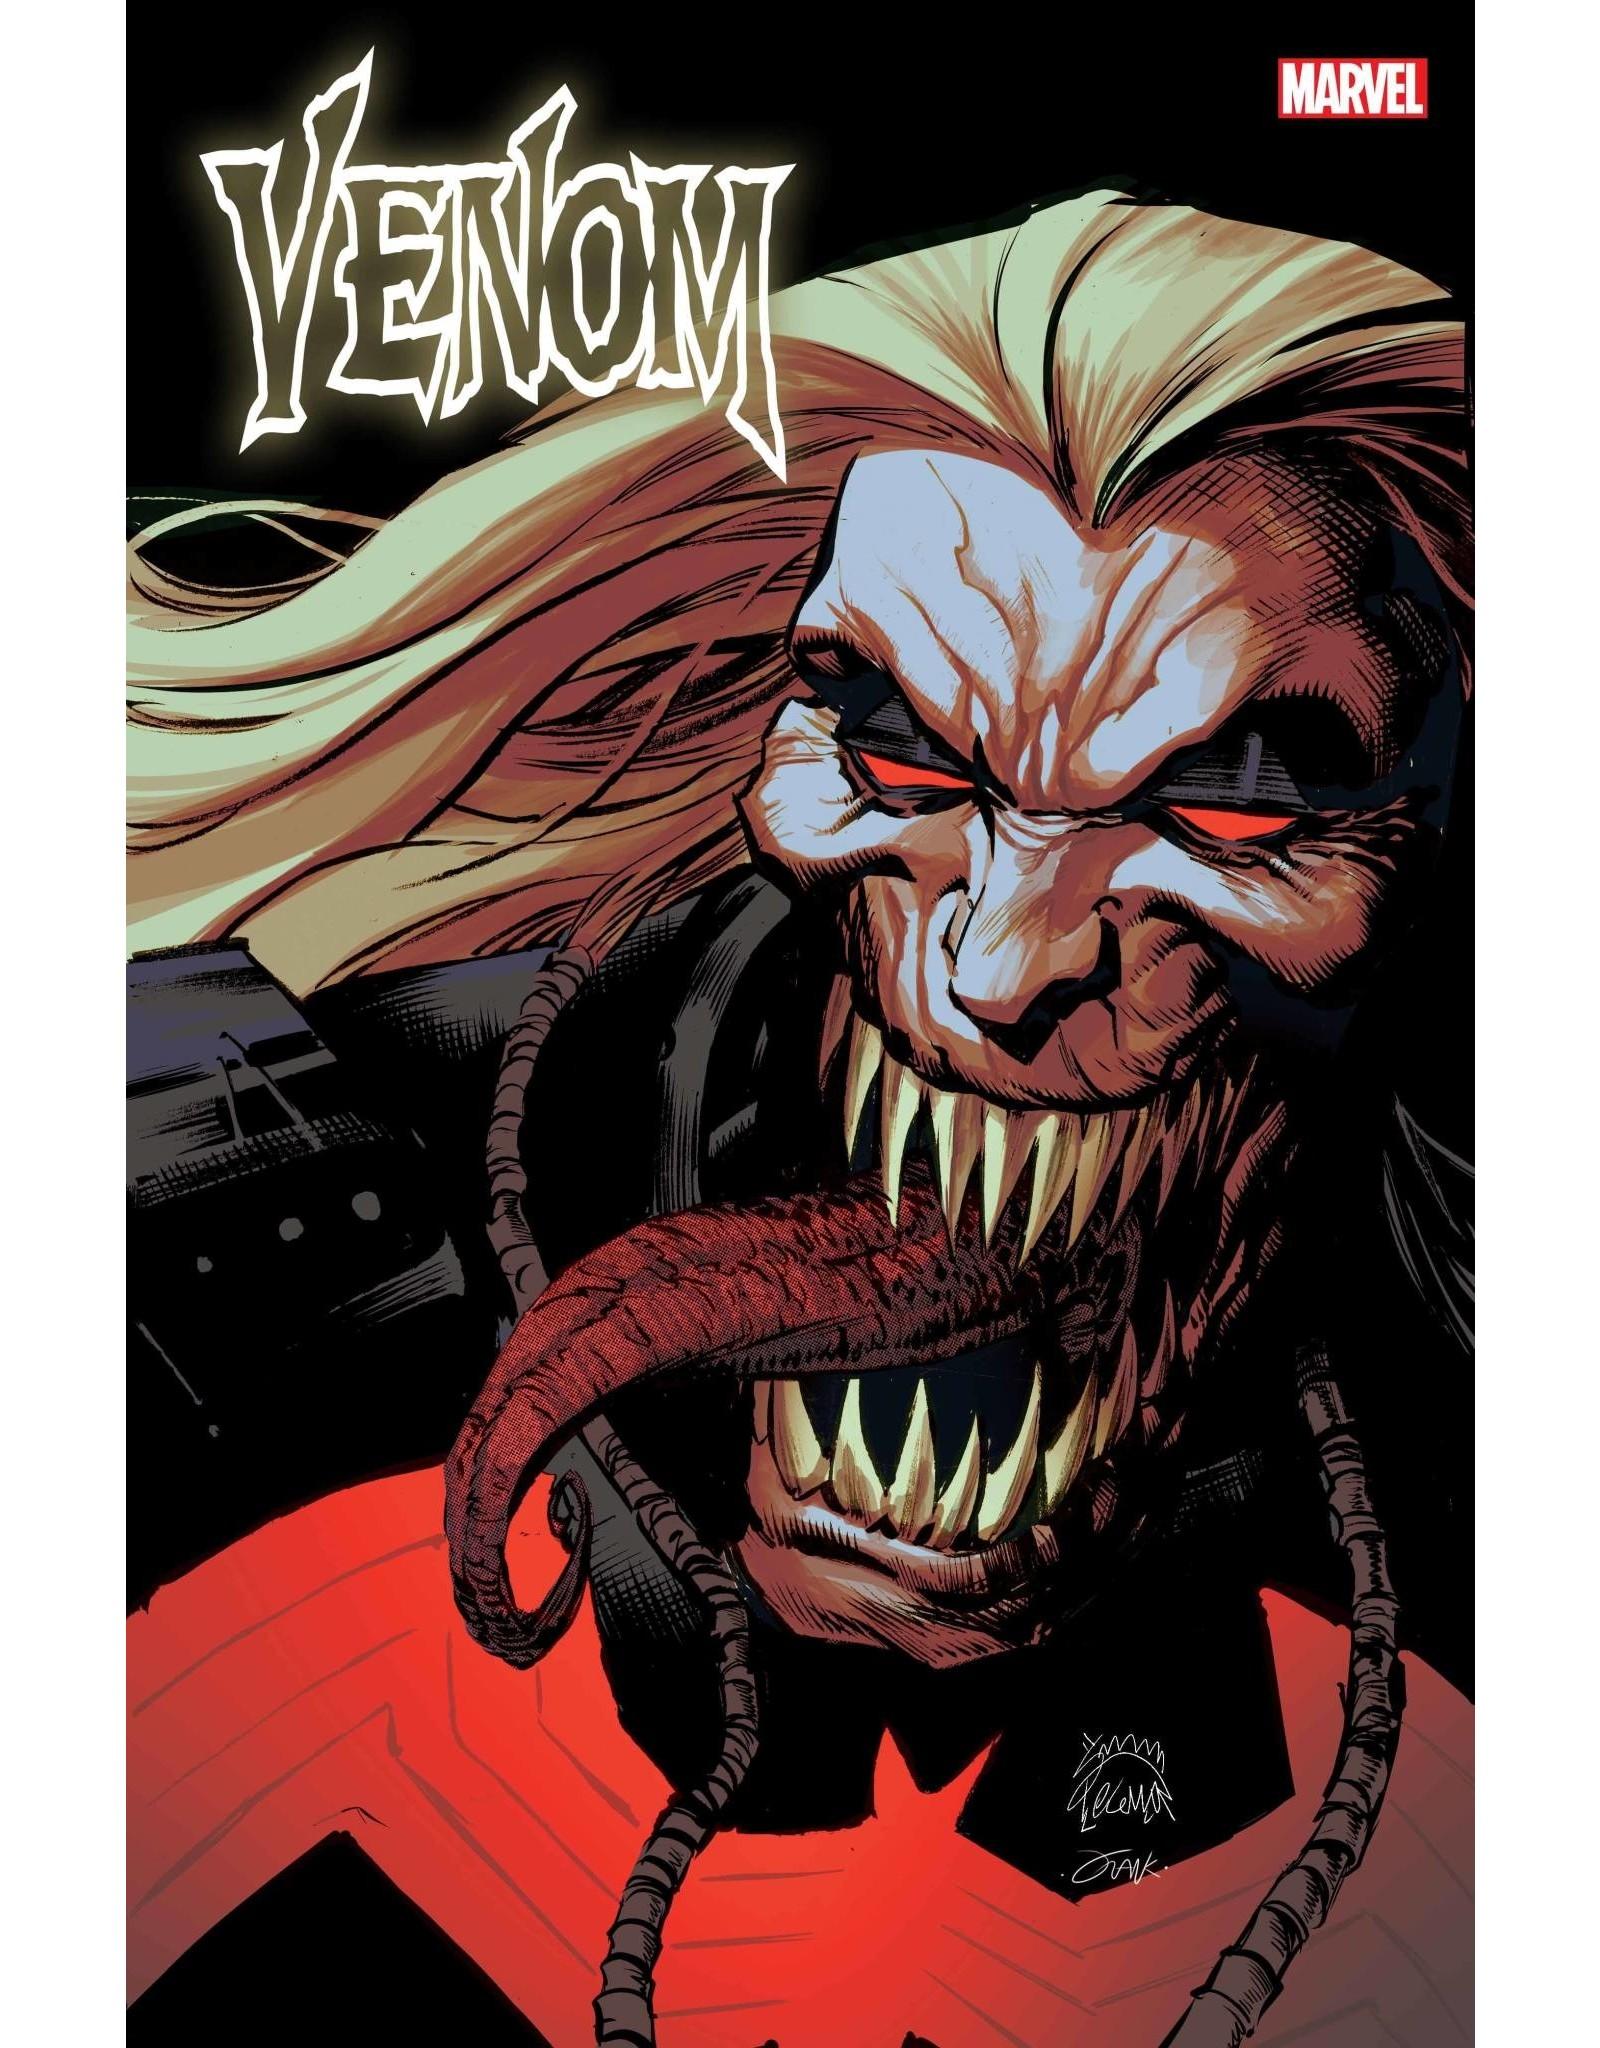 Marvel Comics VENOM #31 STEGMAN VAR KIB